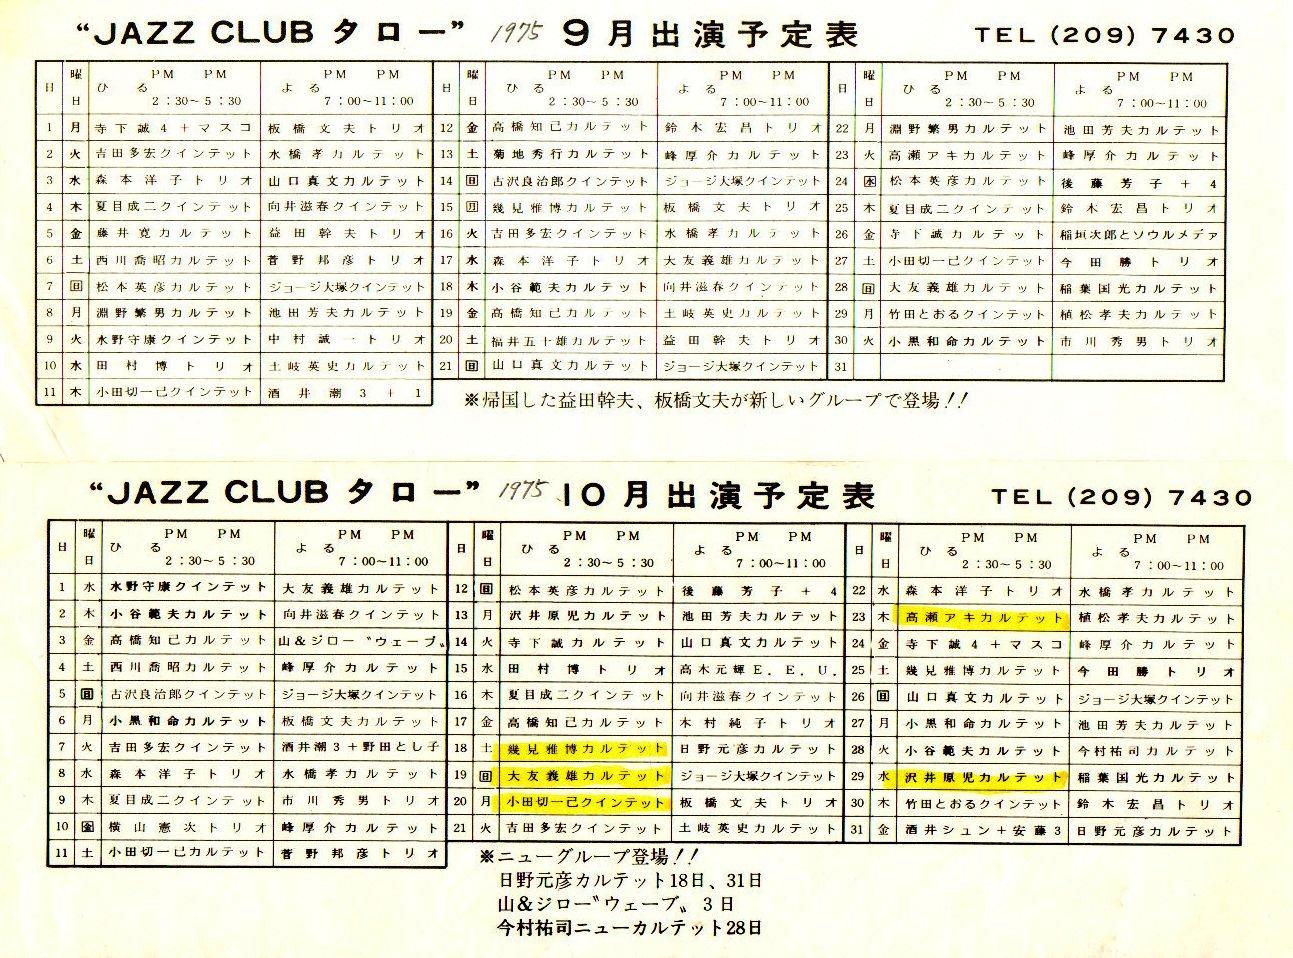 Jazz_club_taro_197509_10